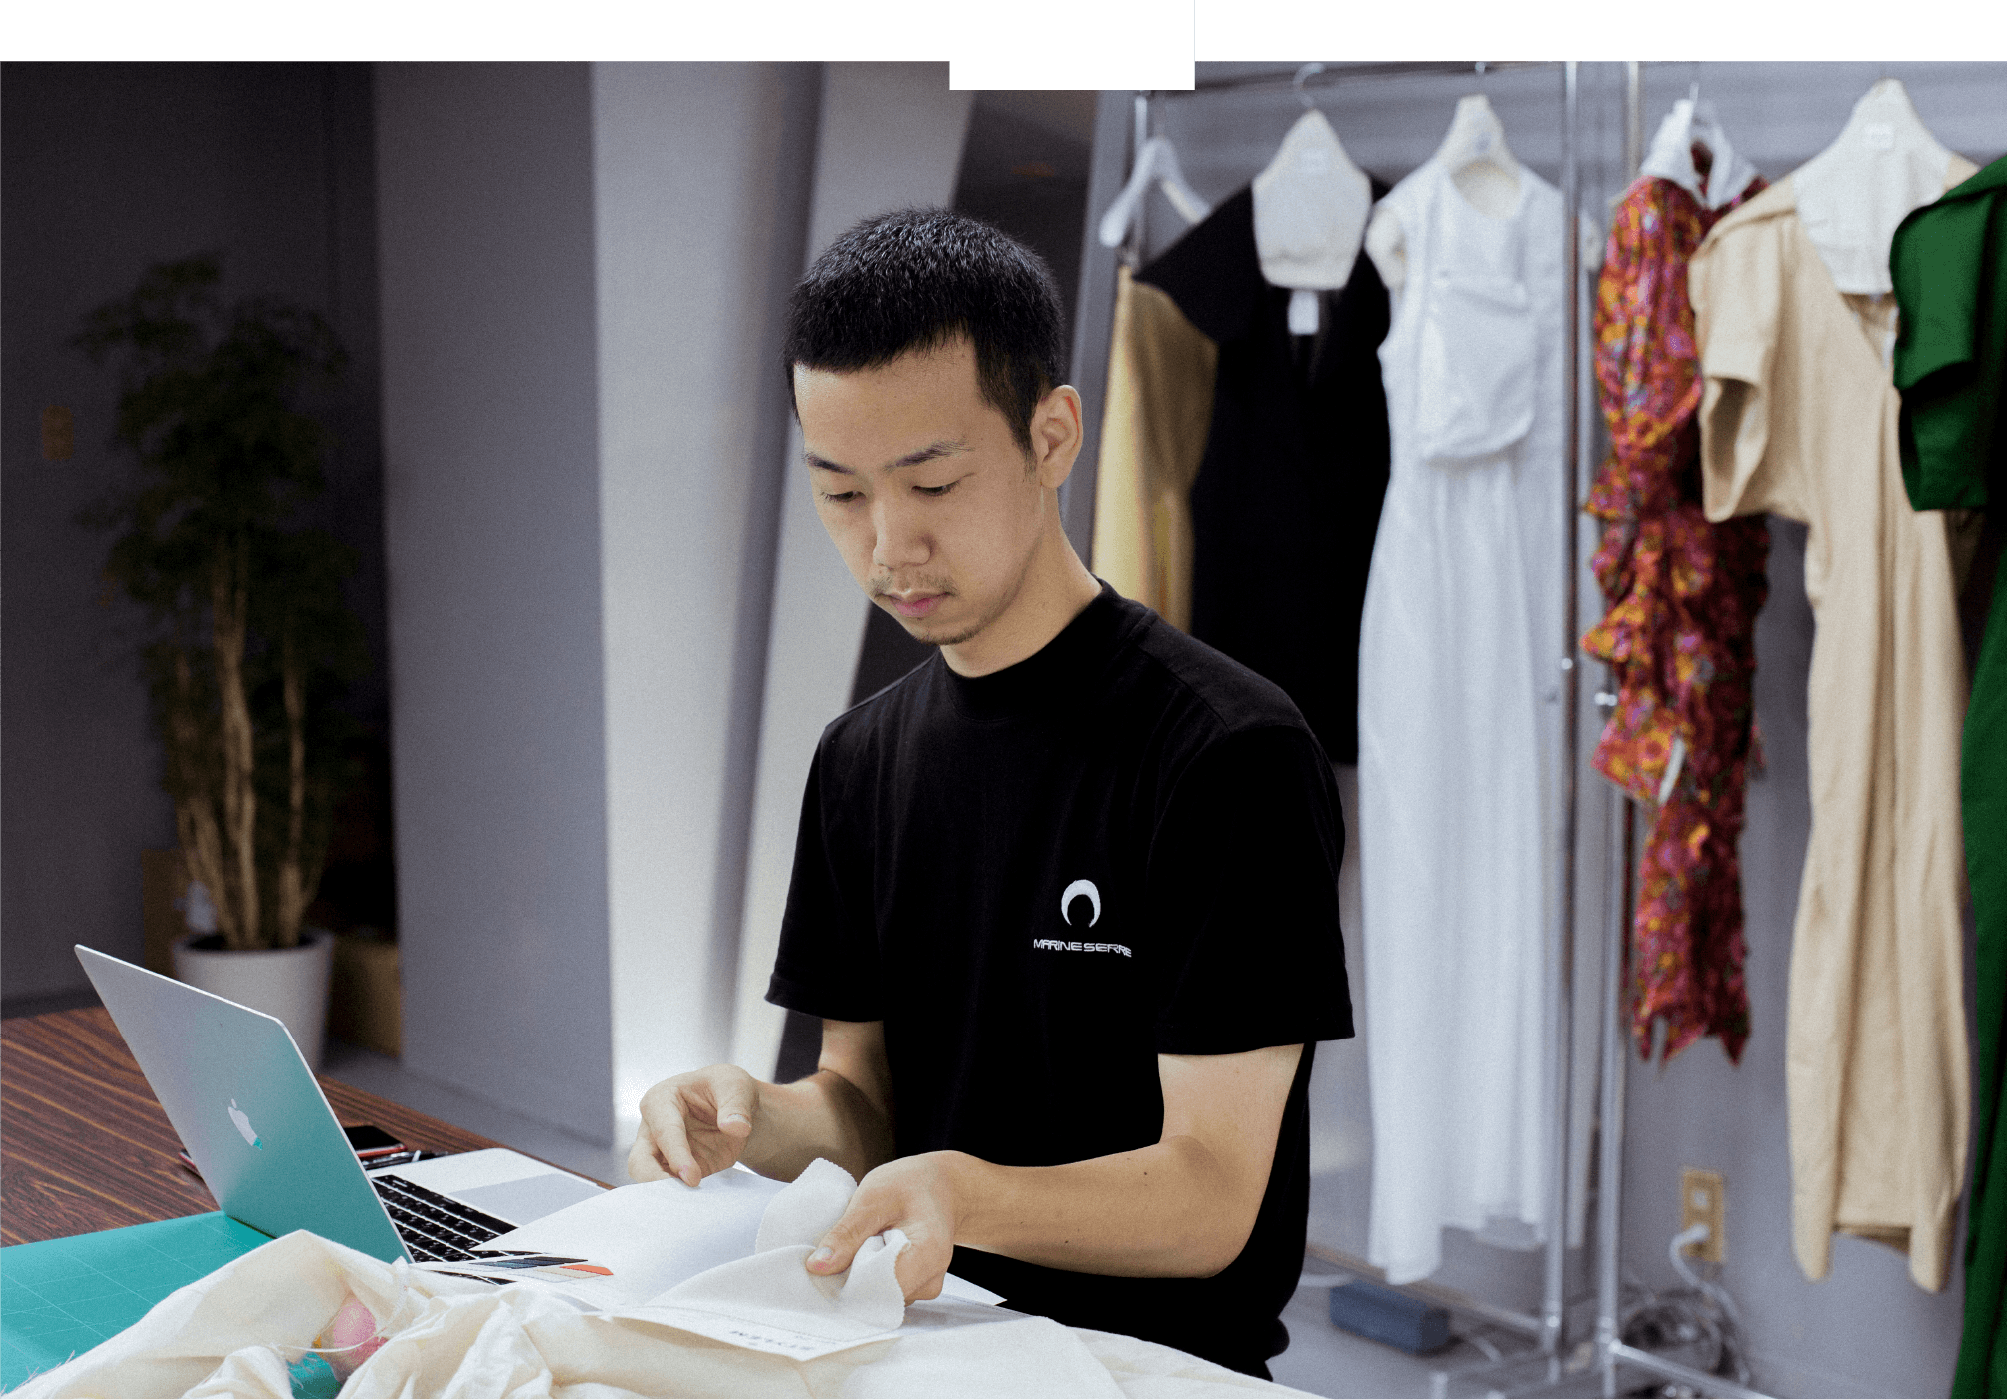 hanzawa measuring clothes